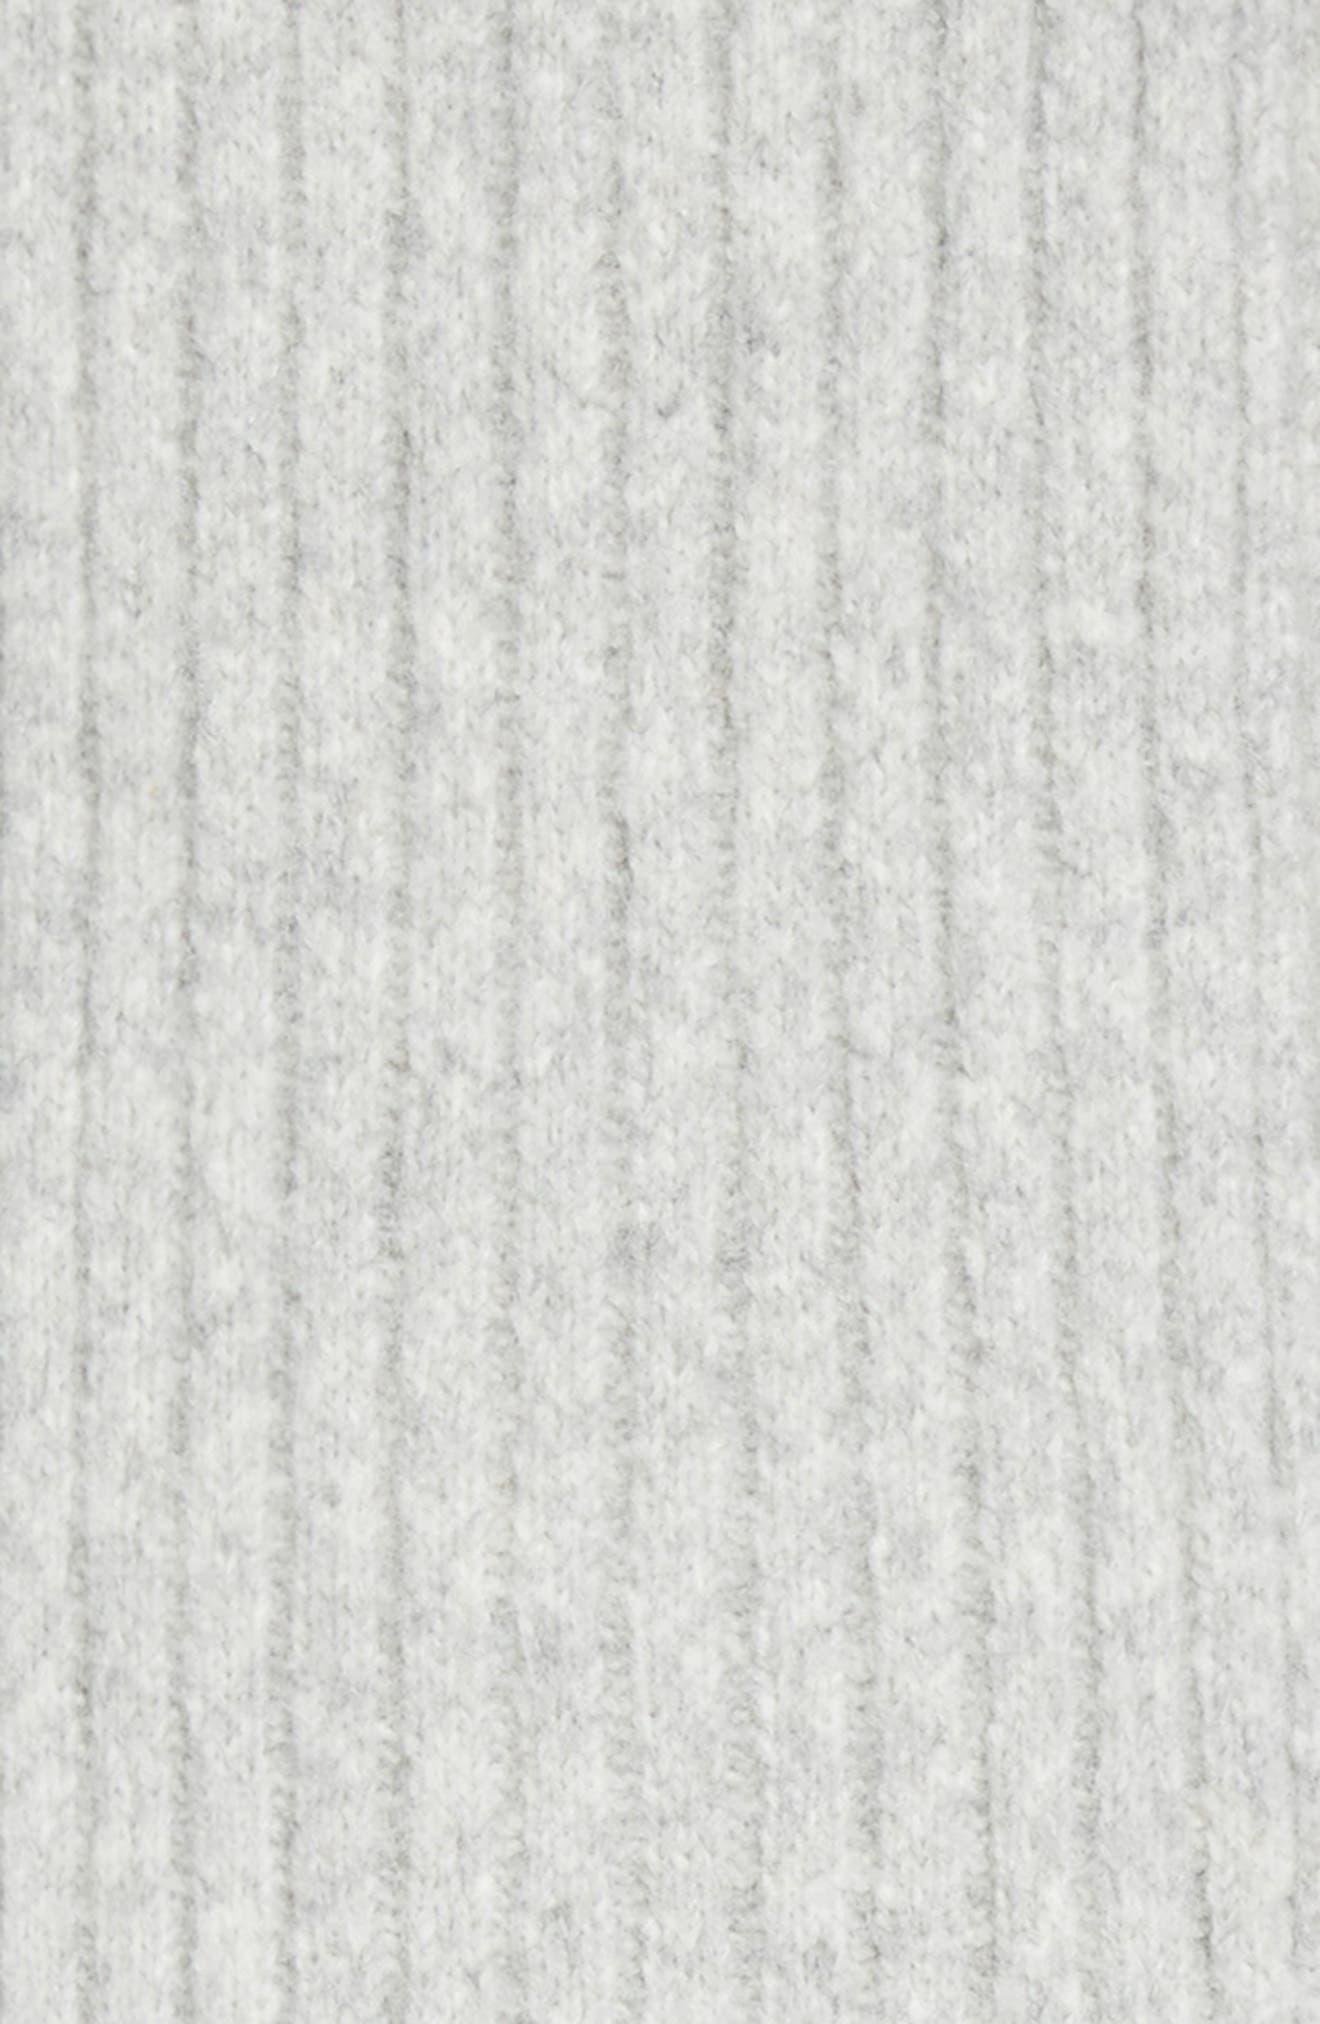 Fringed Alpaca Blend Scarf,                             Alternate thumbnail 2, color,                             020